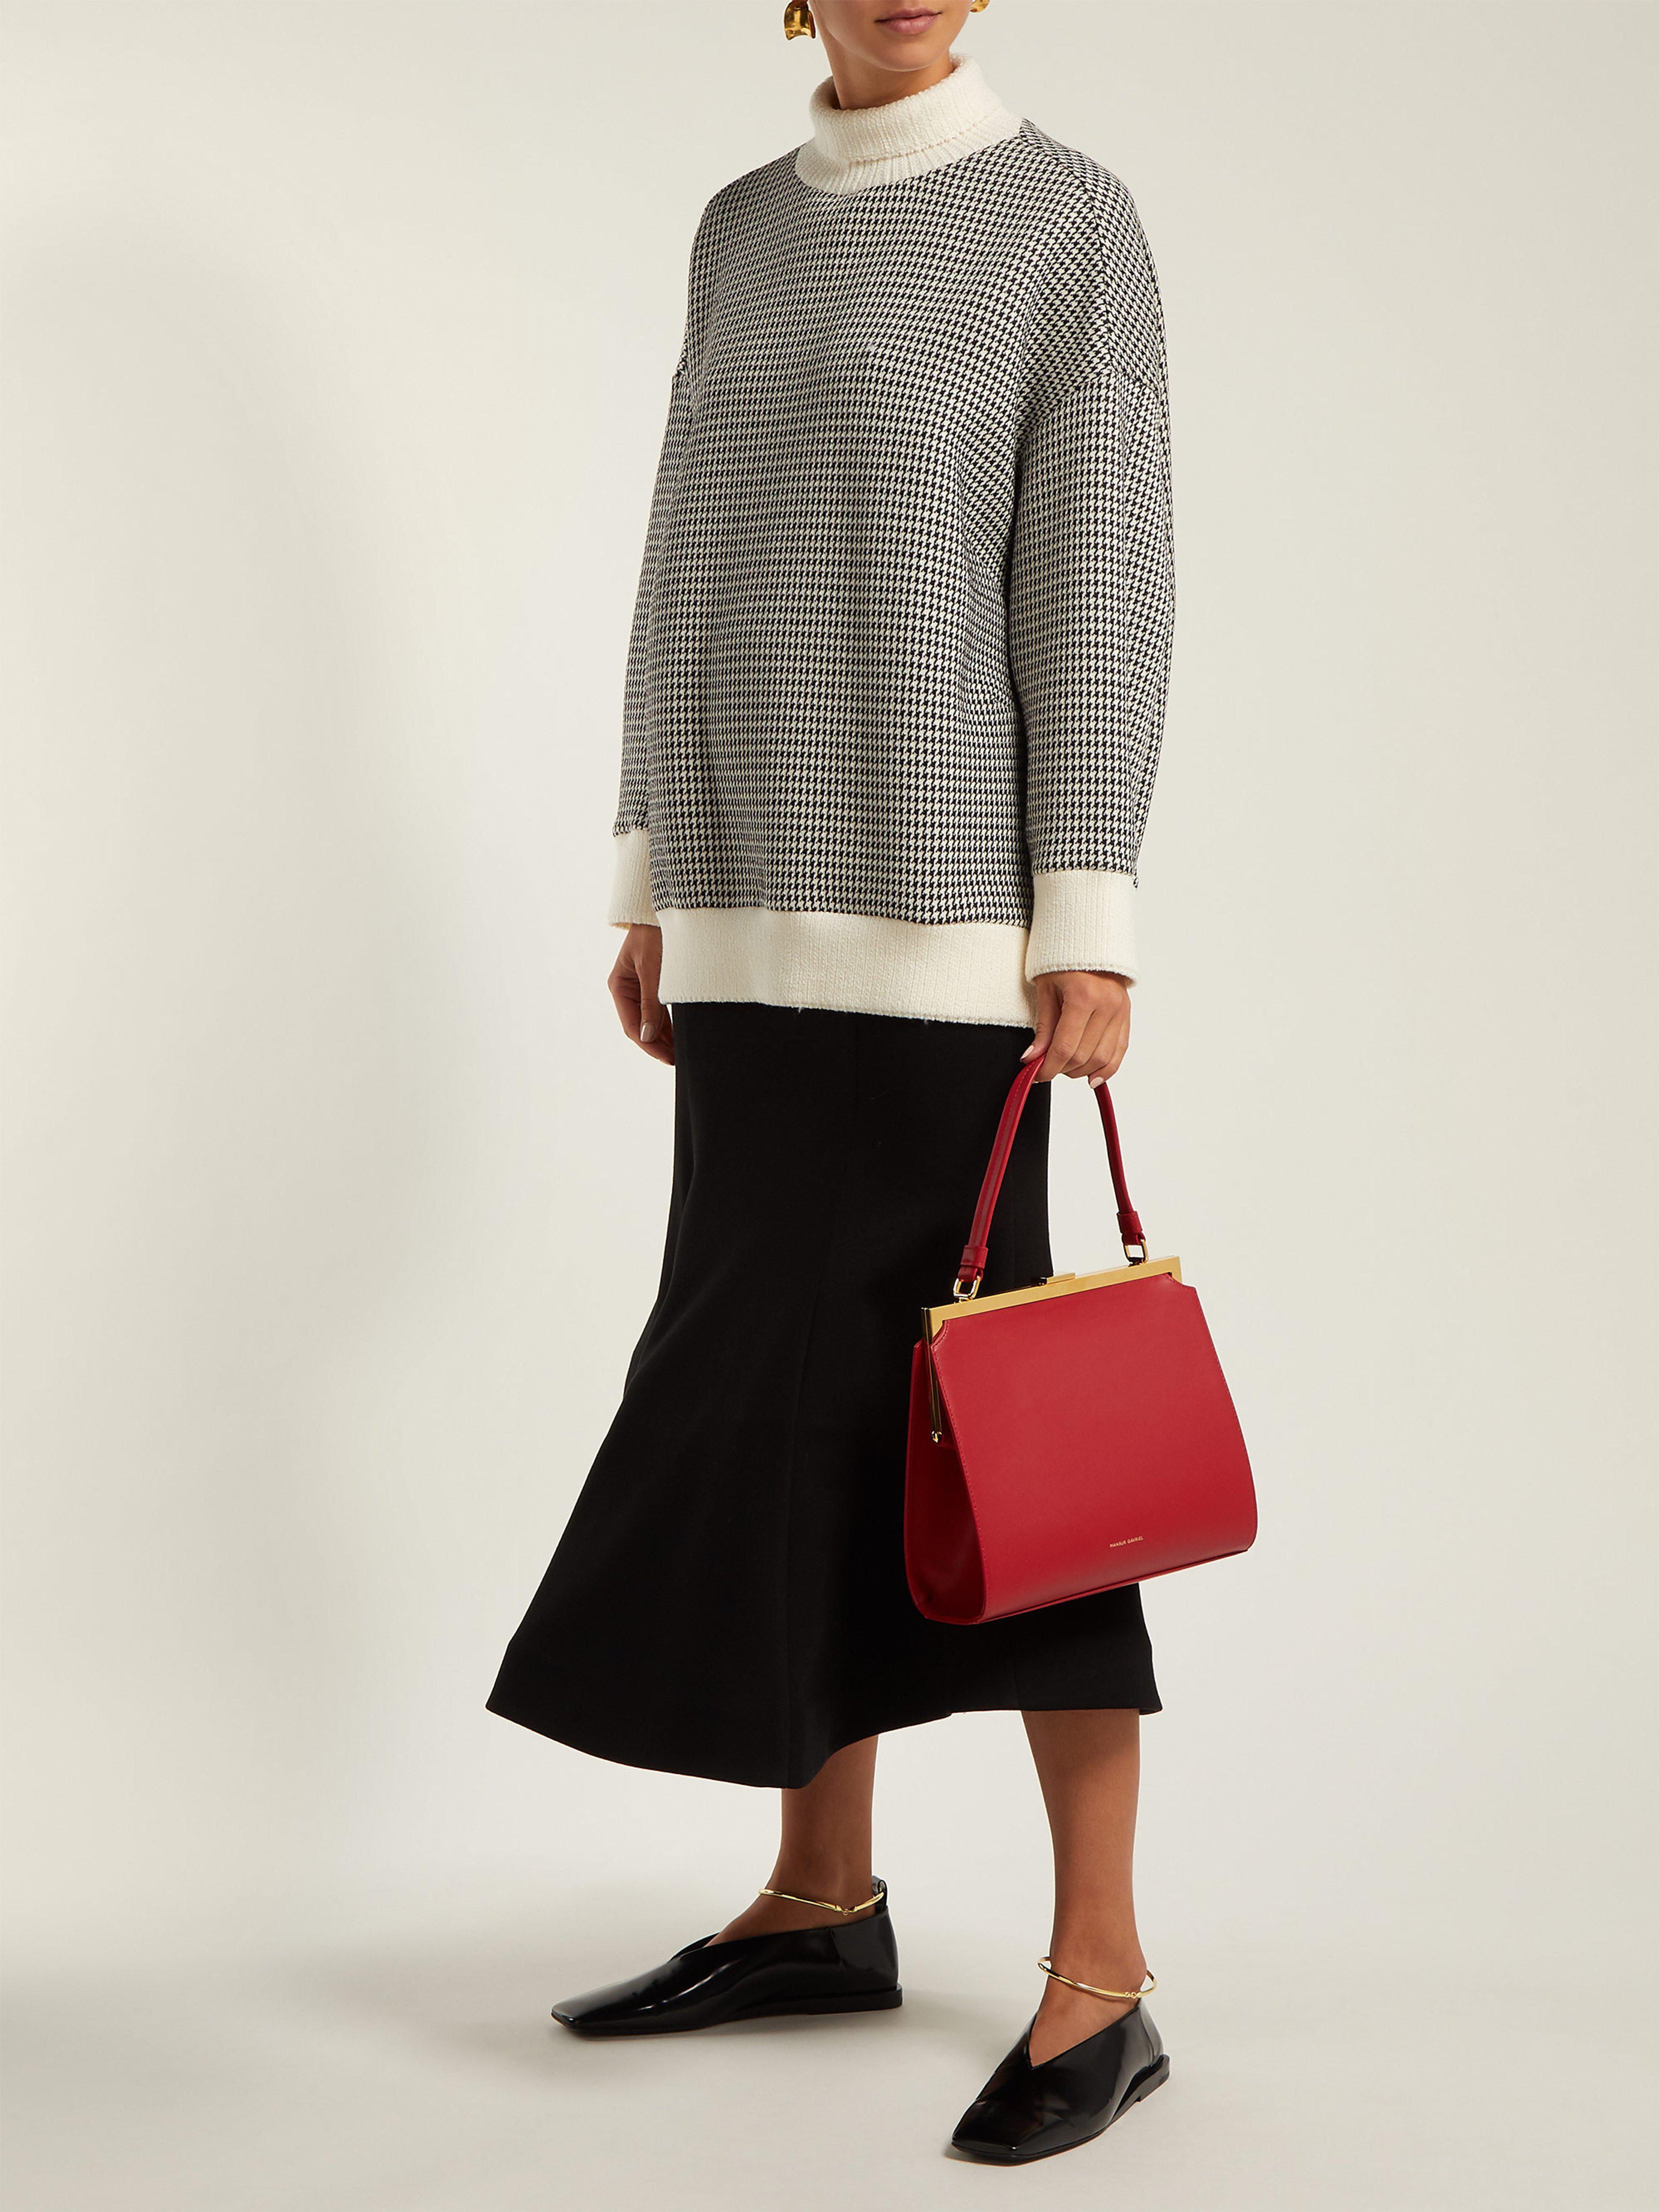 006391c4a022 Mansur Gavriel Elegant Leather Bag in Red - Lyst